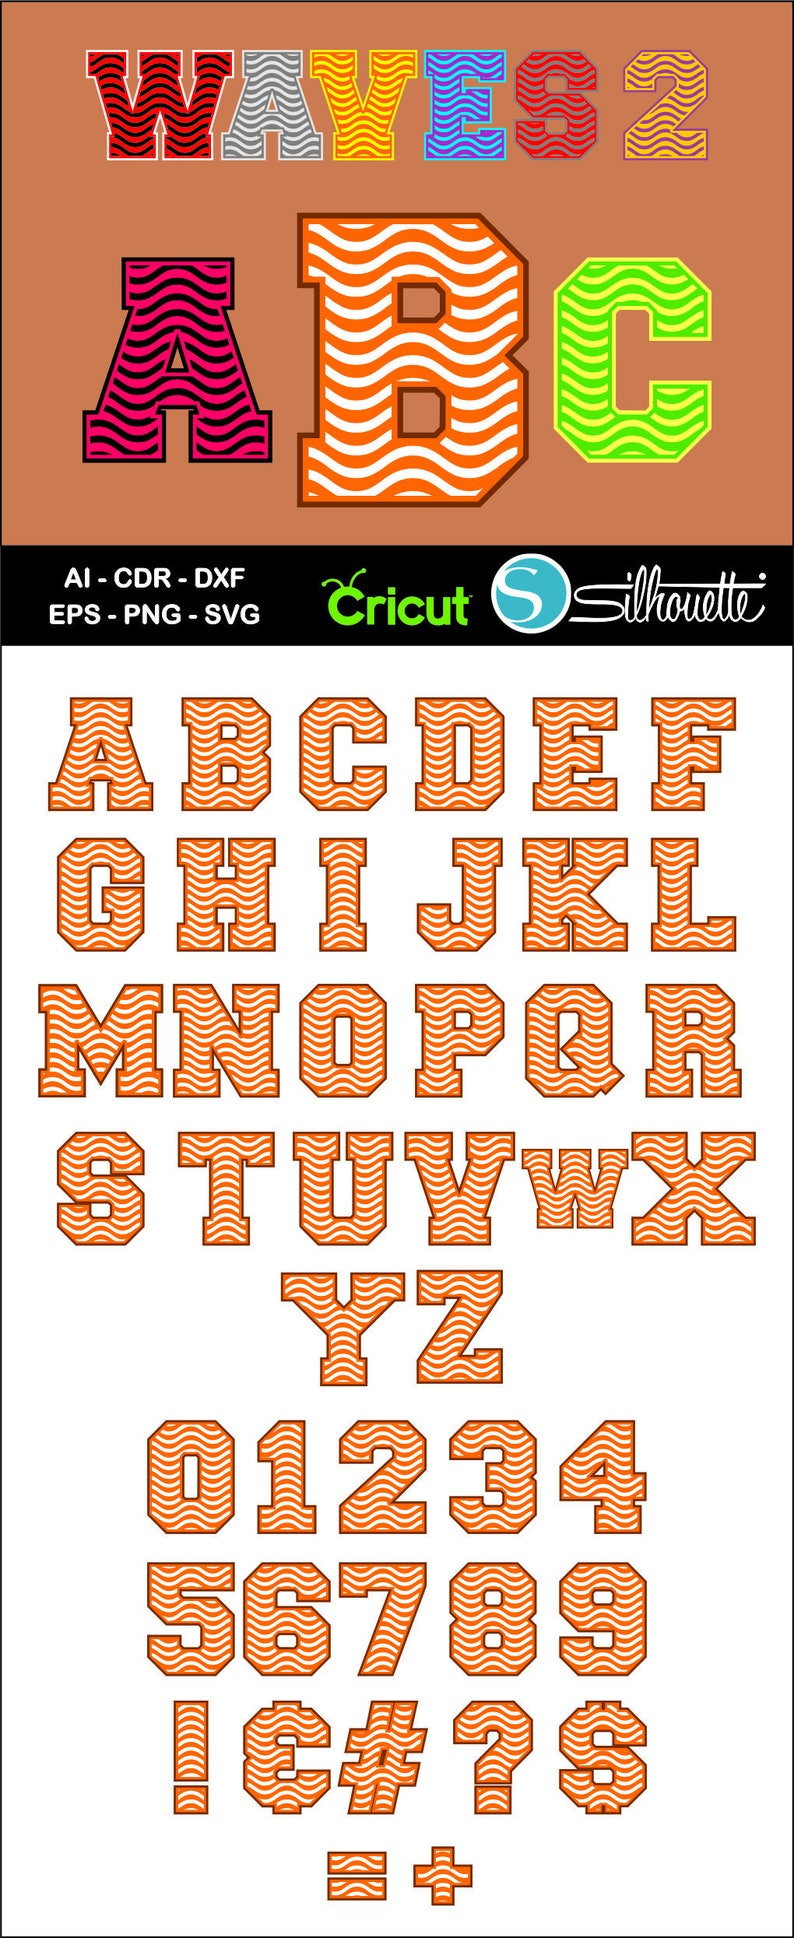 Buy 2 get 1 free, Waves Alphabet font, Ai, CDR, Eps, SVG, Dxf, Png, Wave  Letters, Font svg, Cricut, Silhouette Studio, Waves pattern